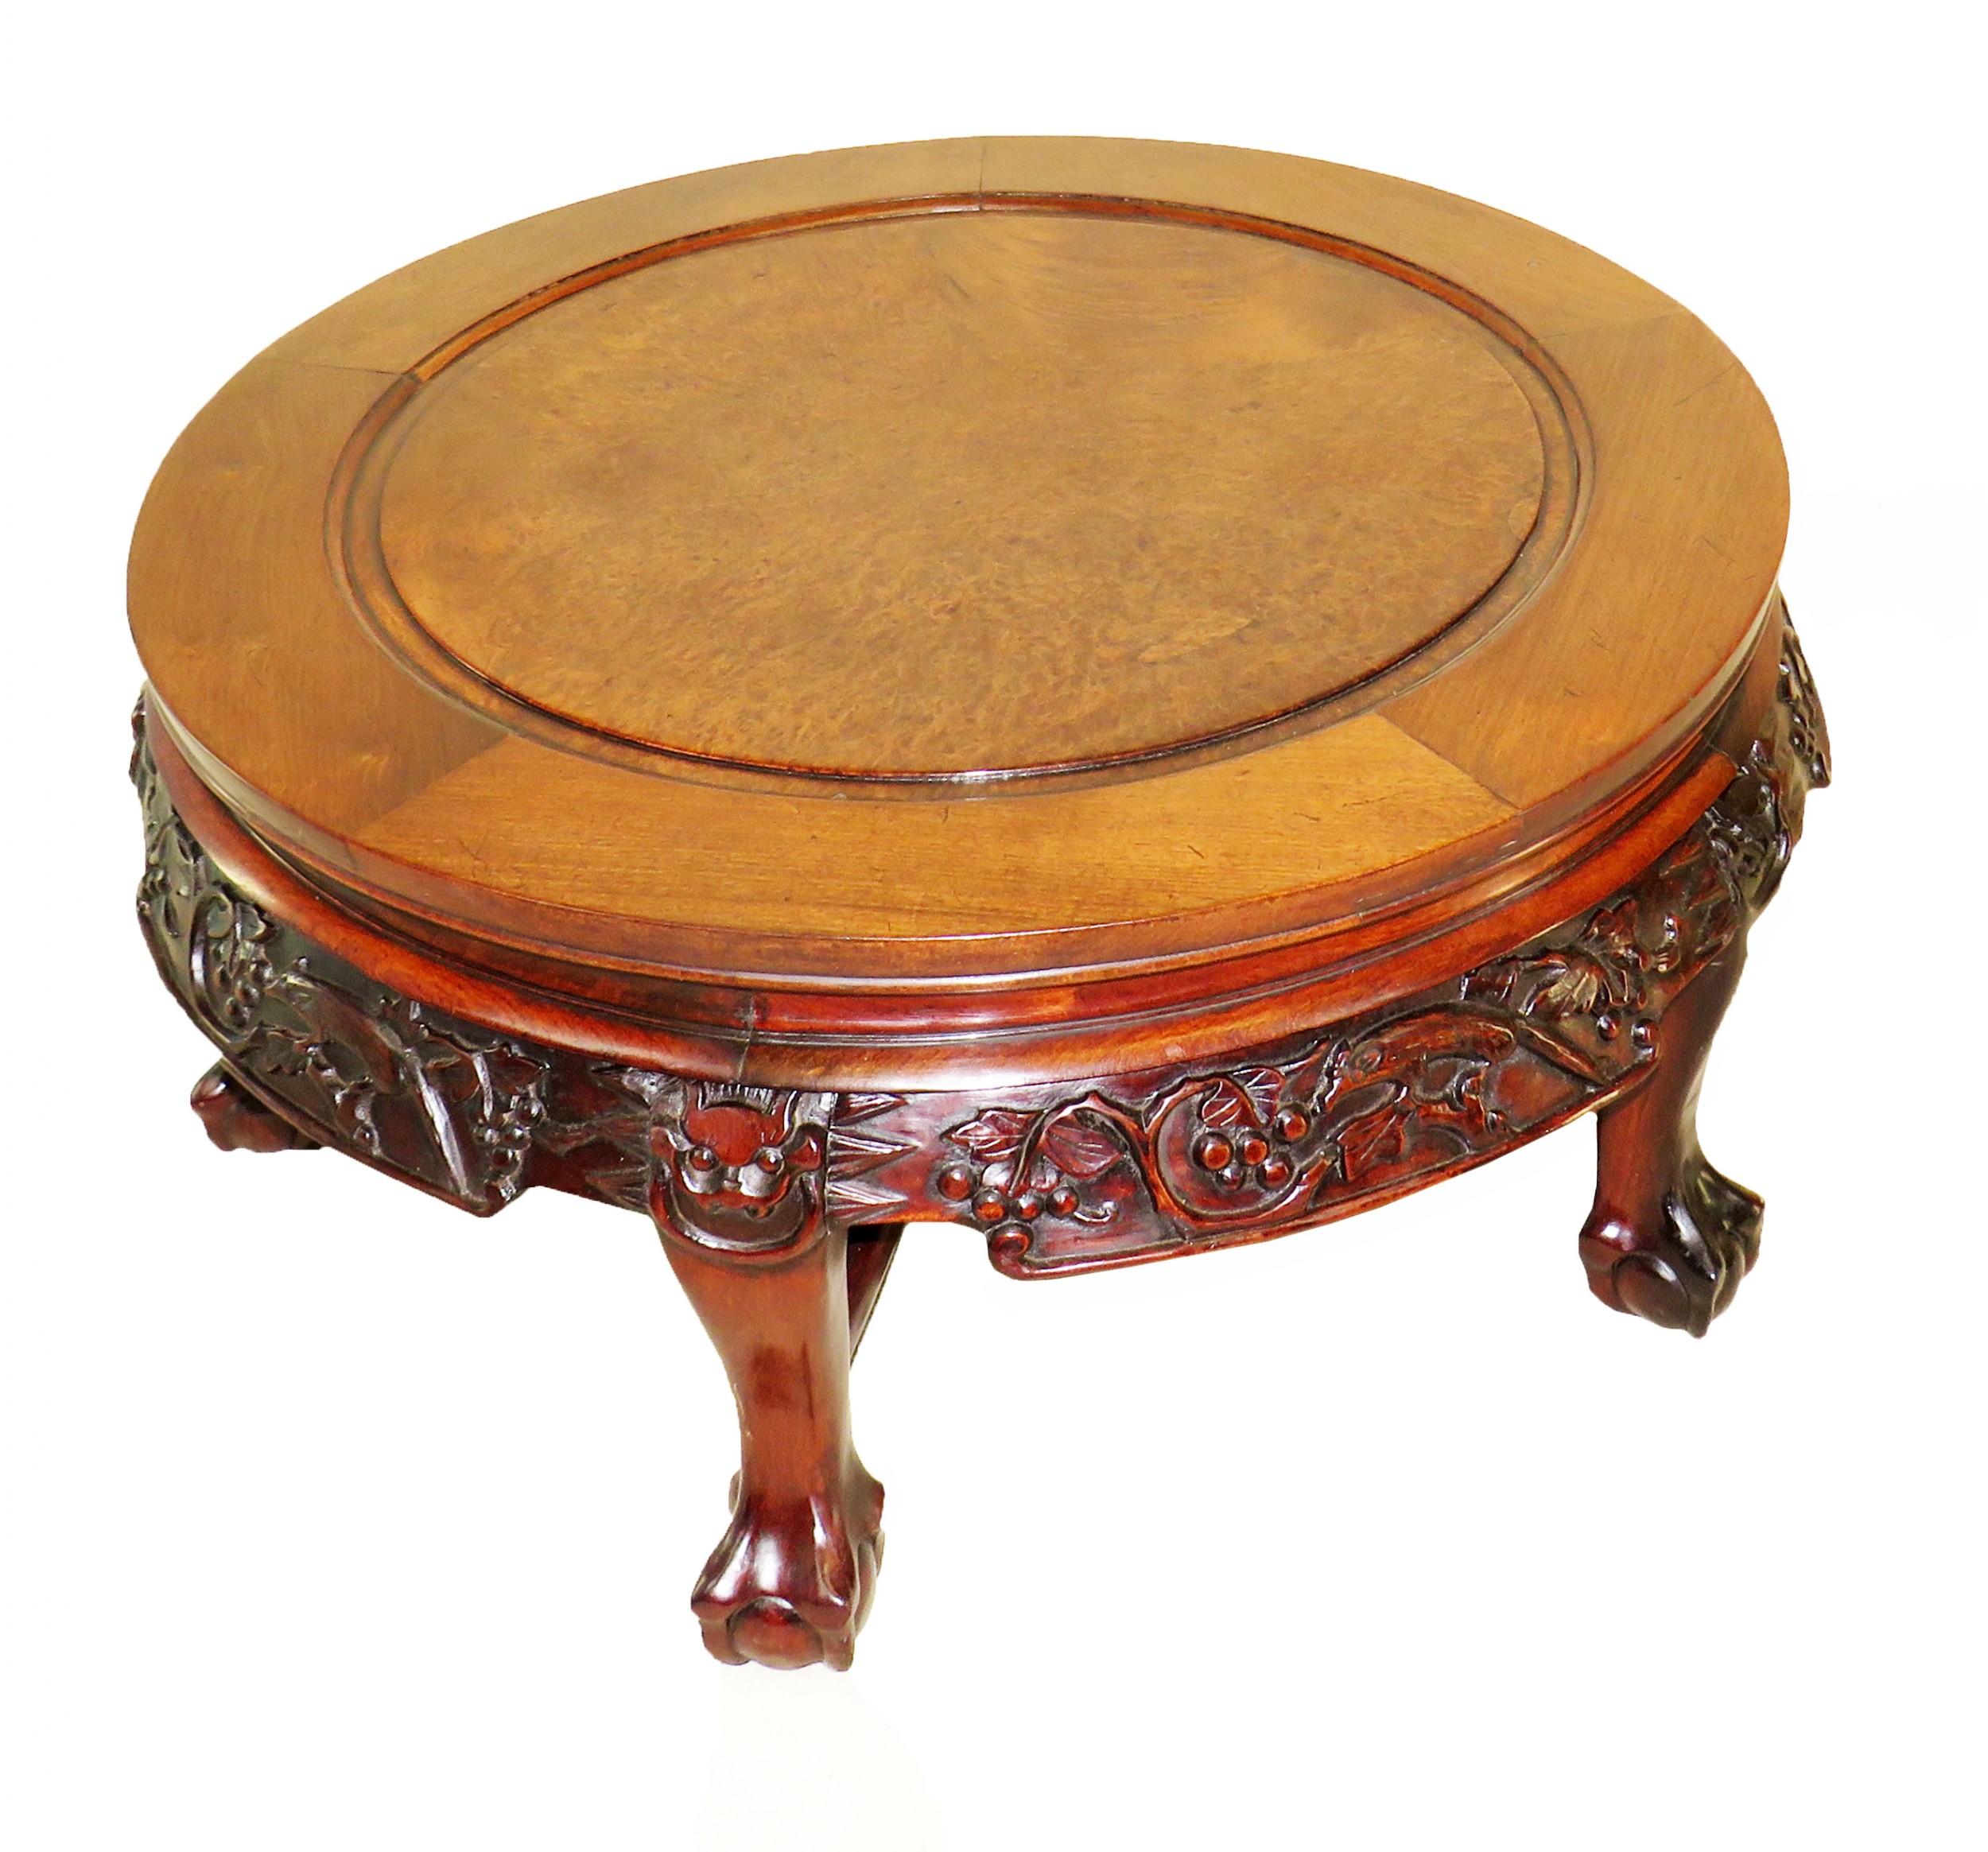 19th century oriental hardwood circular coffee table